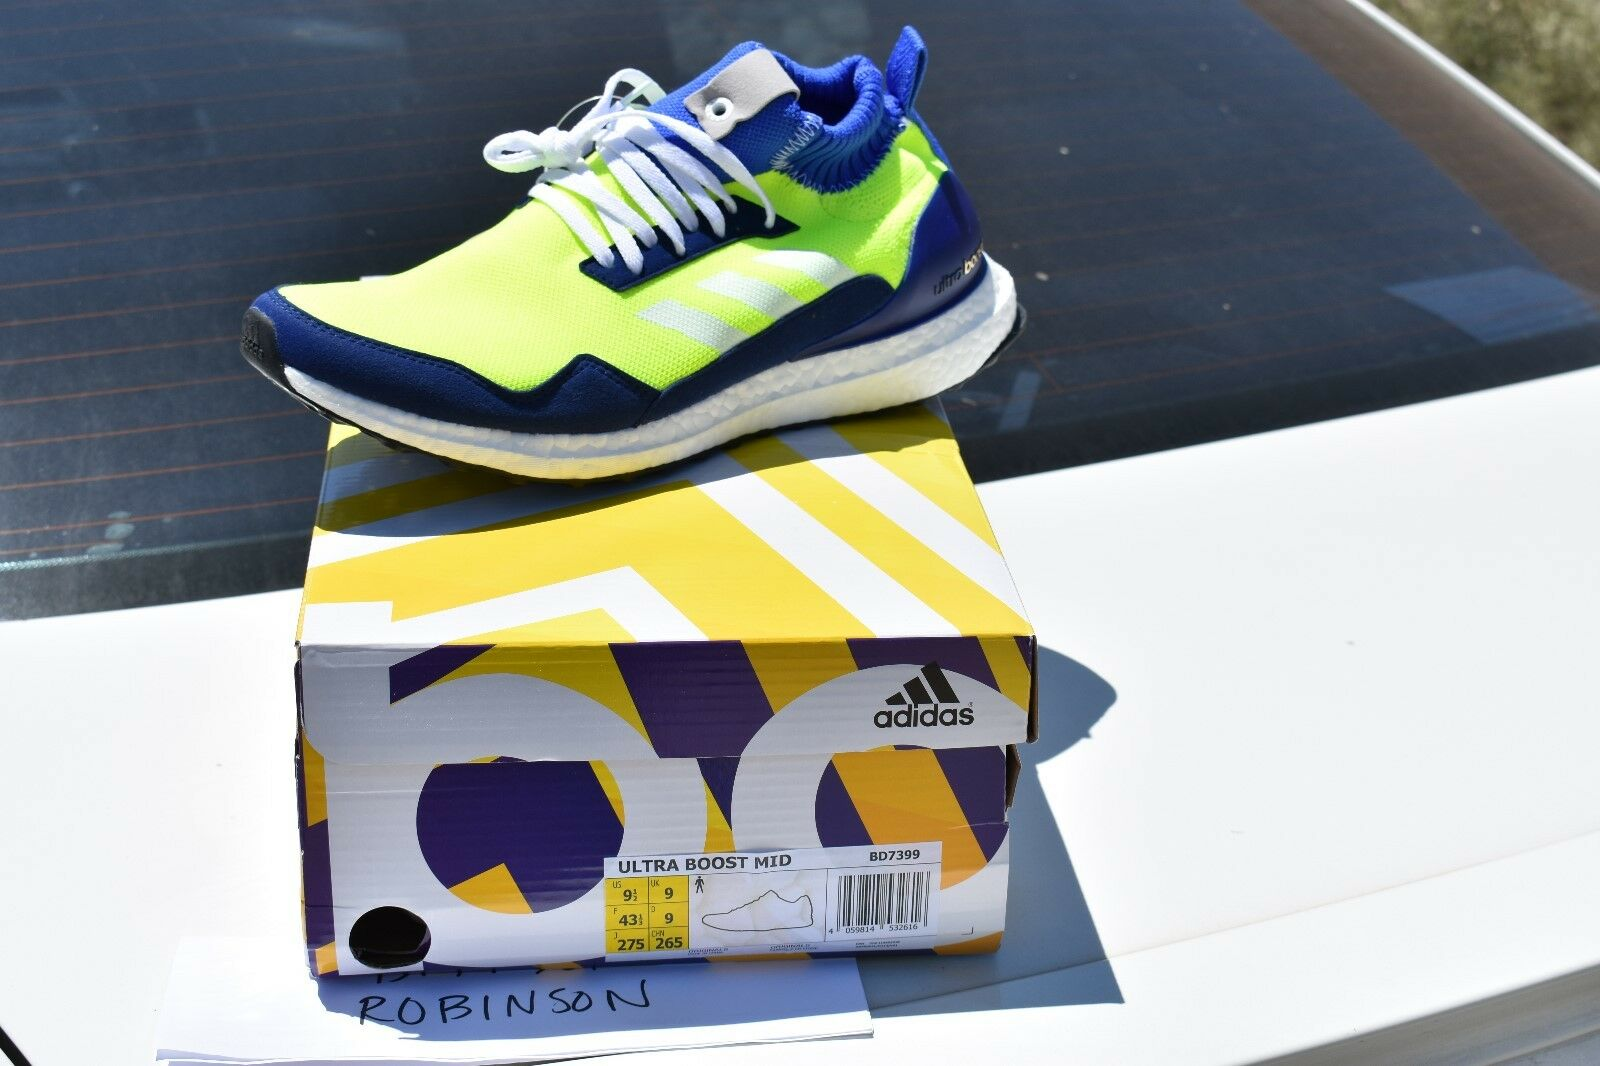 4e024eb34 Adidas Ultra Boost Mid Predotype sz 9.5 BD7399 pharrell hu nmd yeezy clima